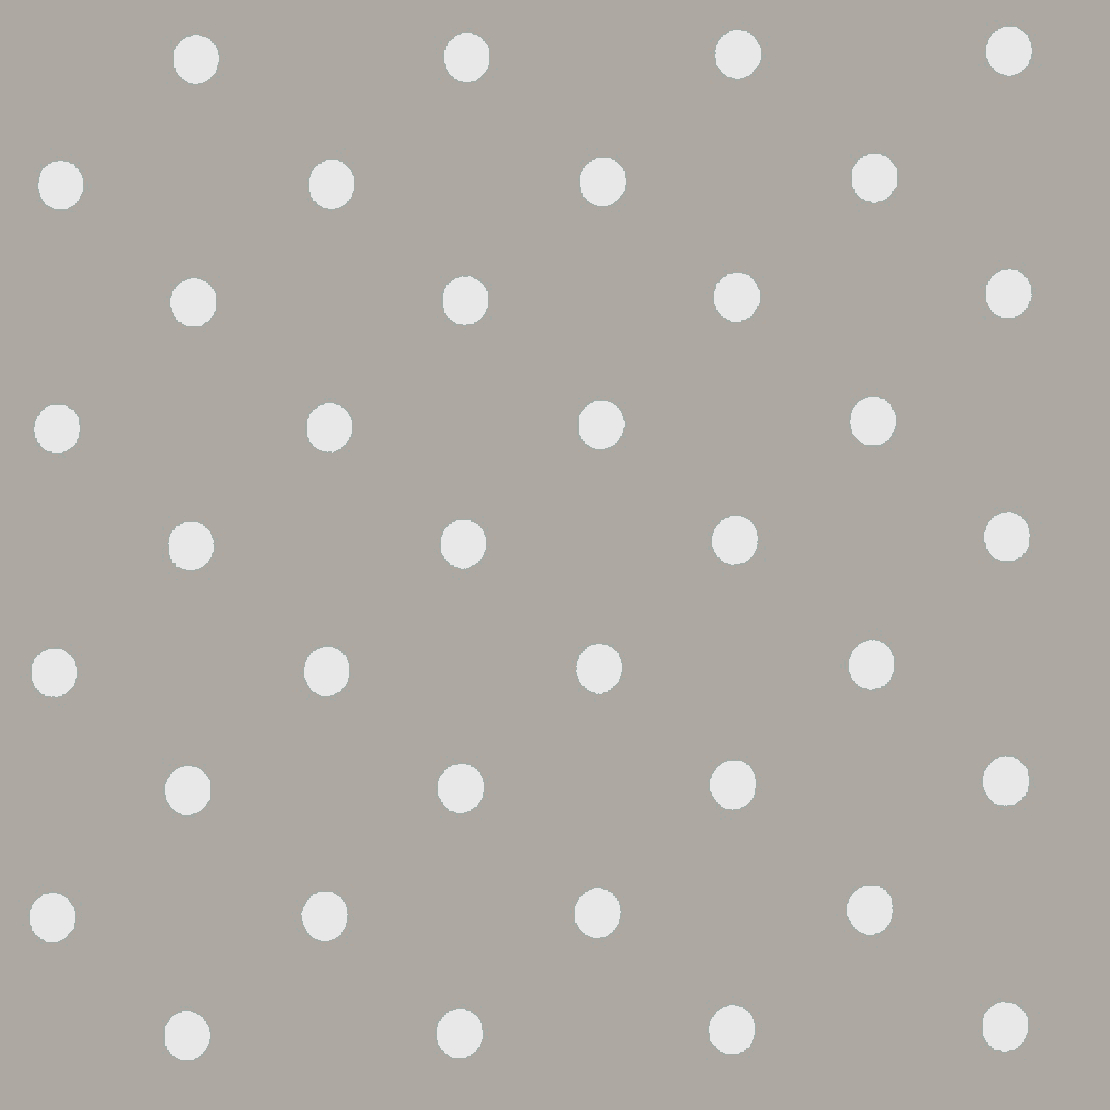 Dots Mushroom Gloss Vinyl Coated Tablecloths Just Wipe